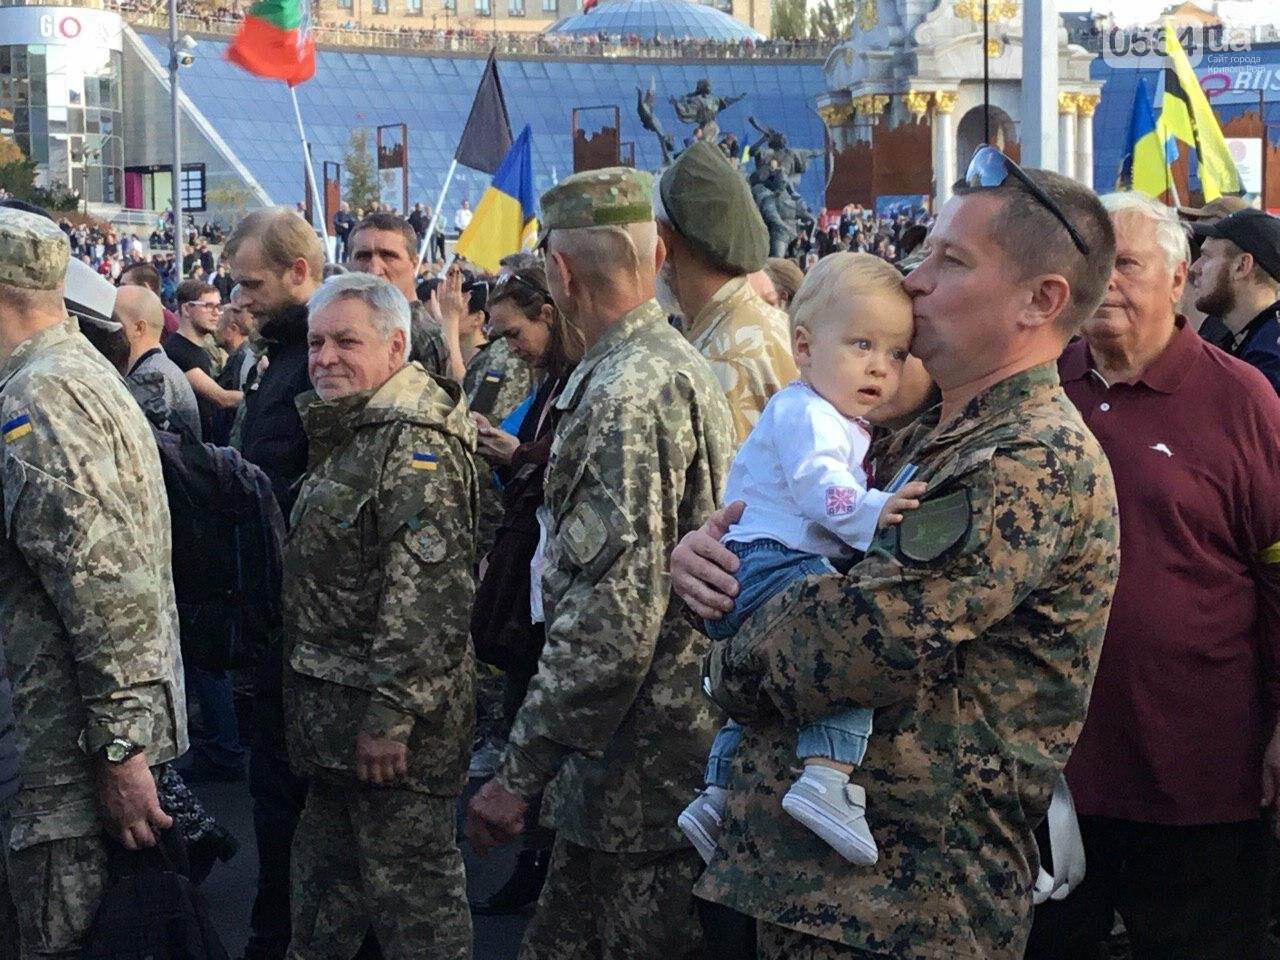 Криворожане поддержали Марш сопротивления капитуляции в Киеве, - ФОТО, ВИДЕО, ОБНОВЛЕНО, фото-30